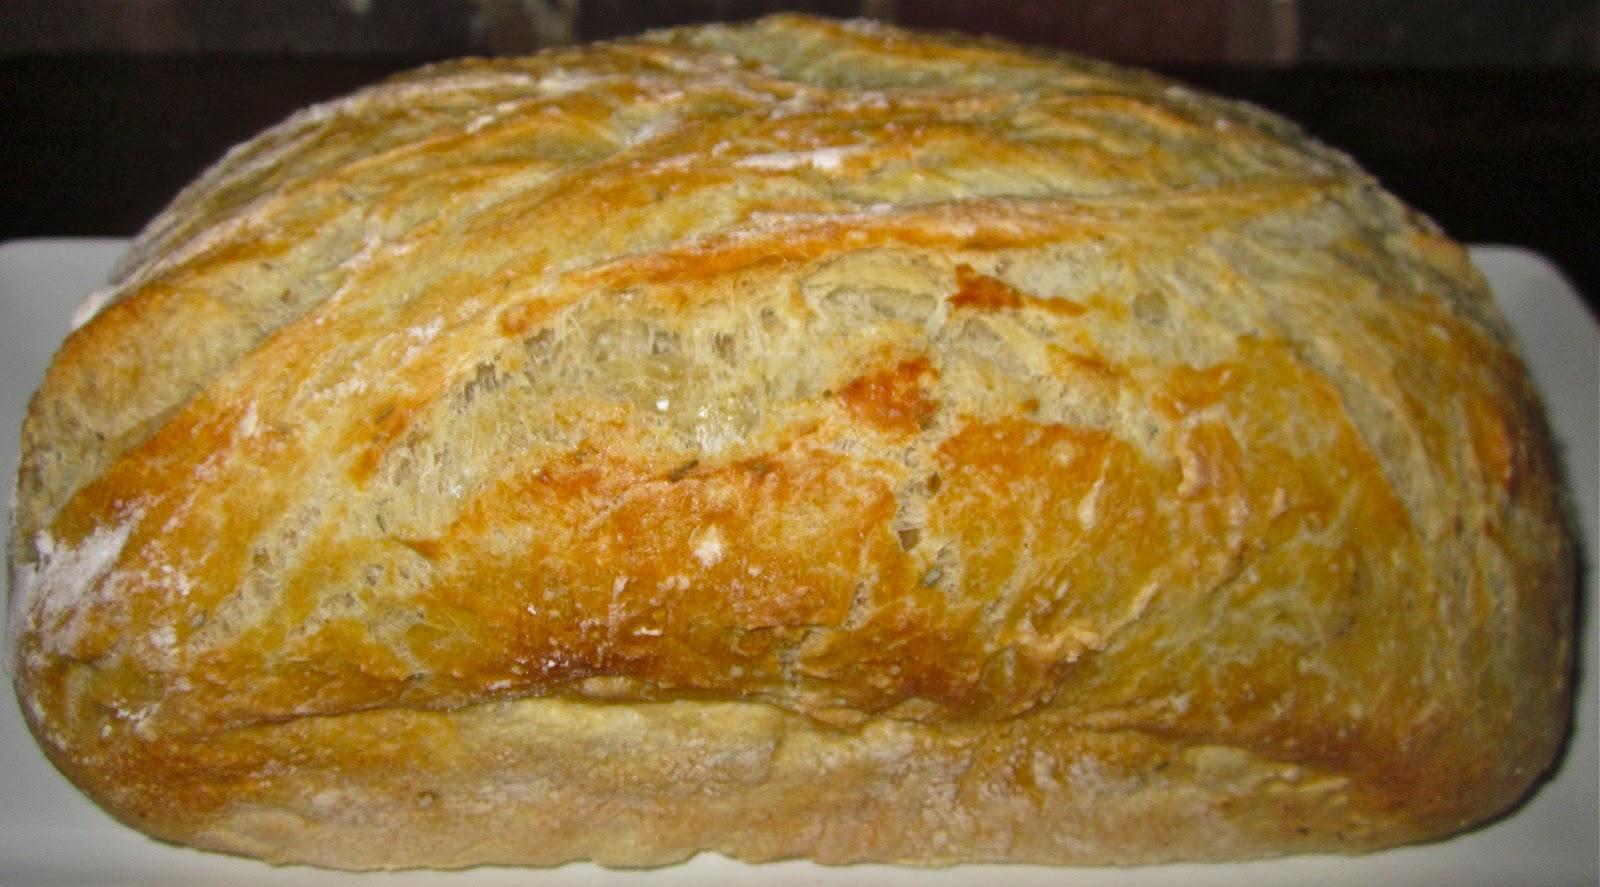 Homemade Roasted Garlic-Parmesan Bread